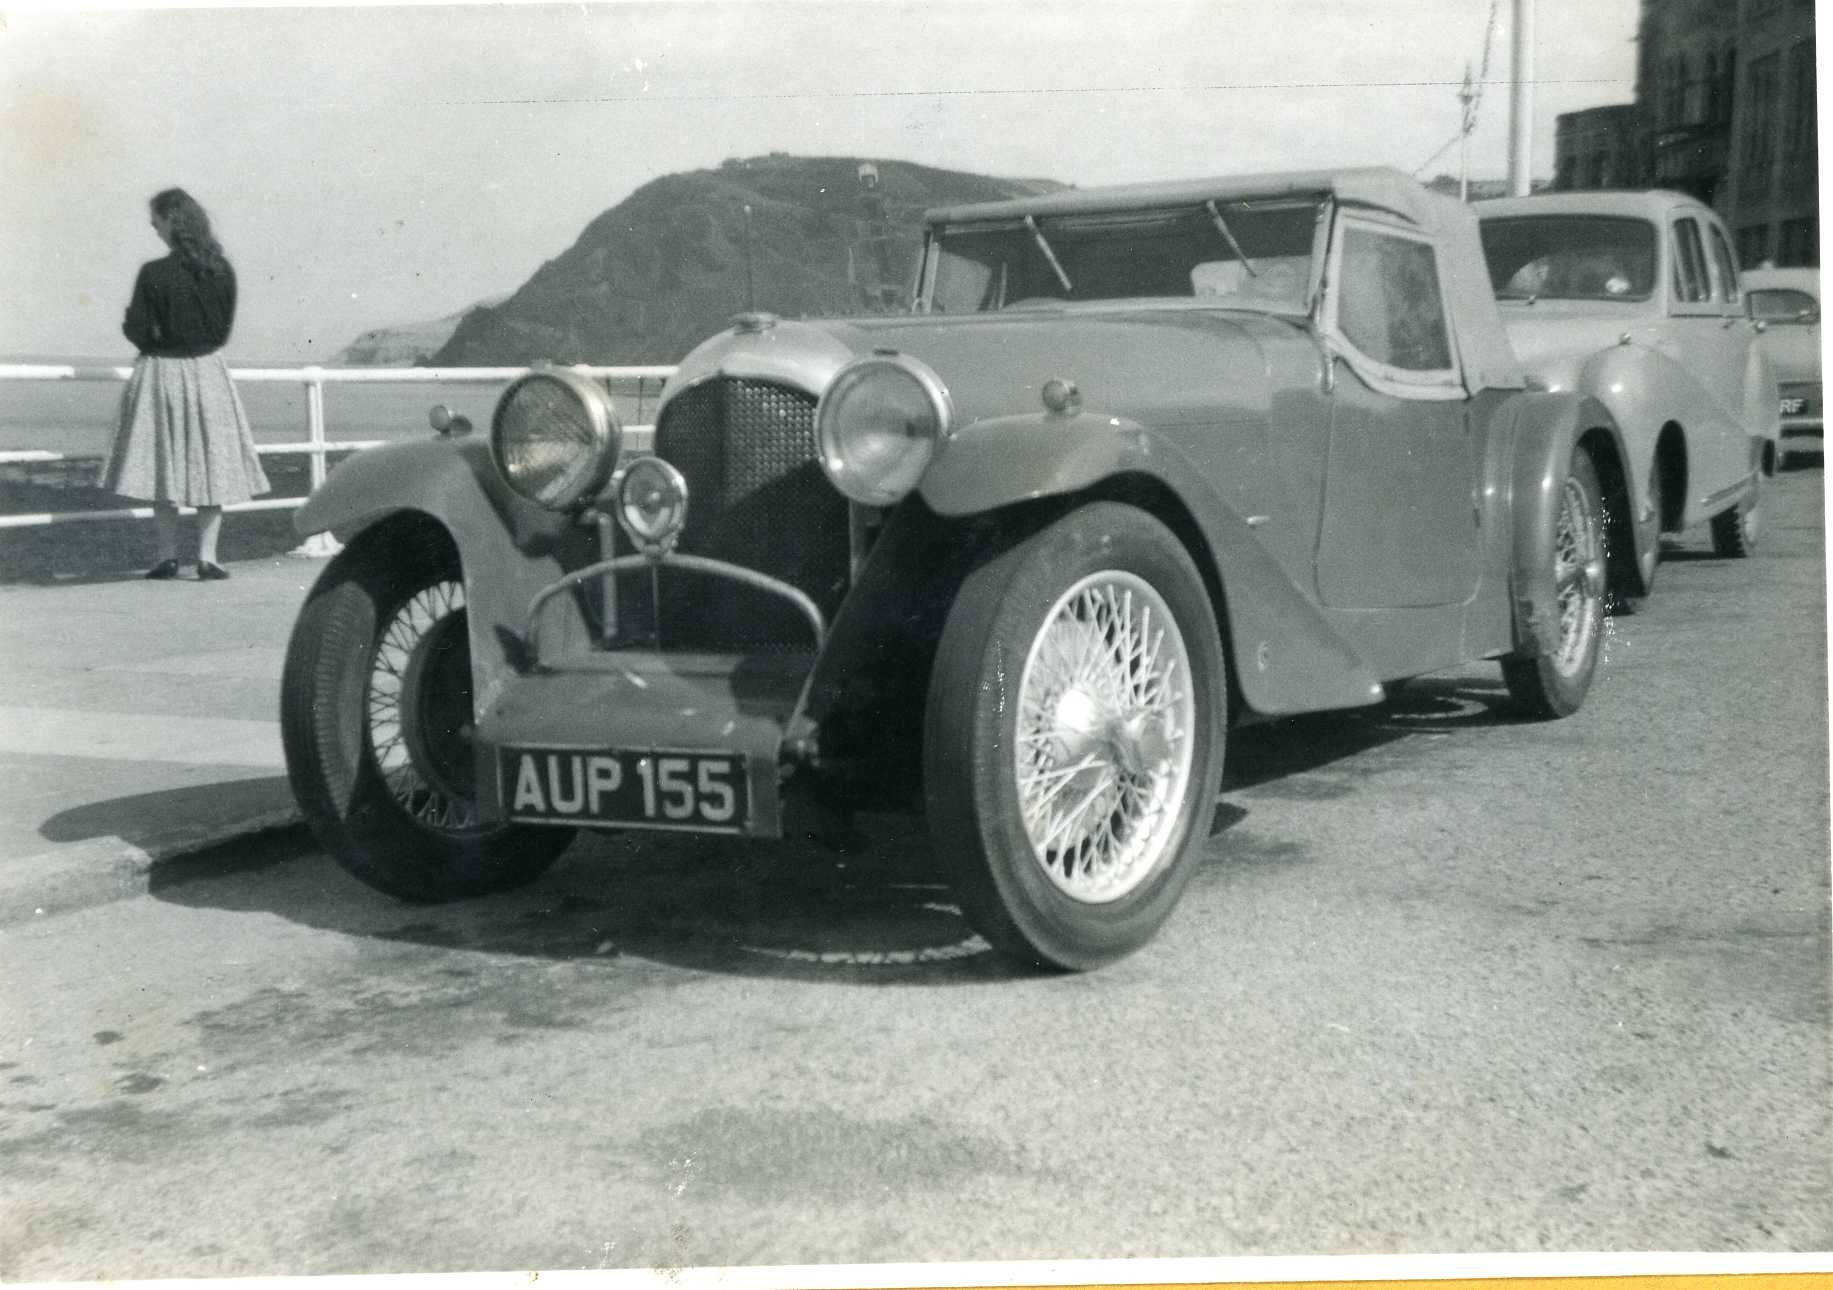 S-W_1950 Marendaz AUP 155